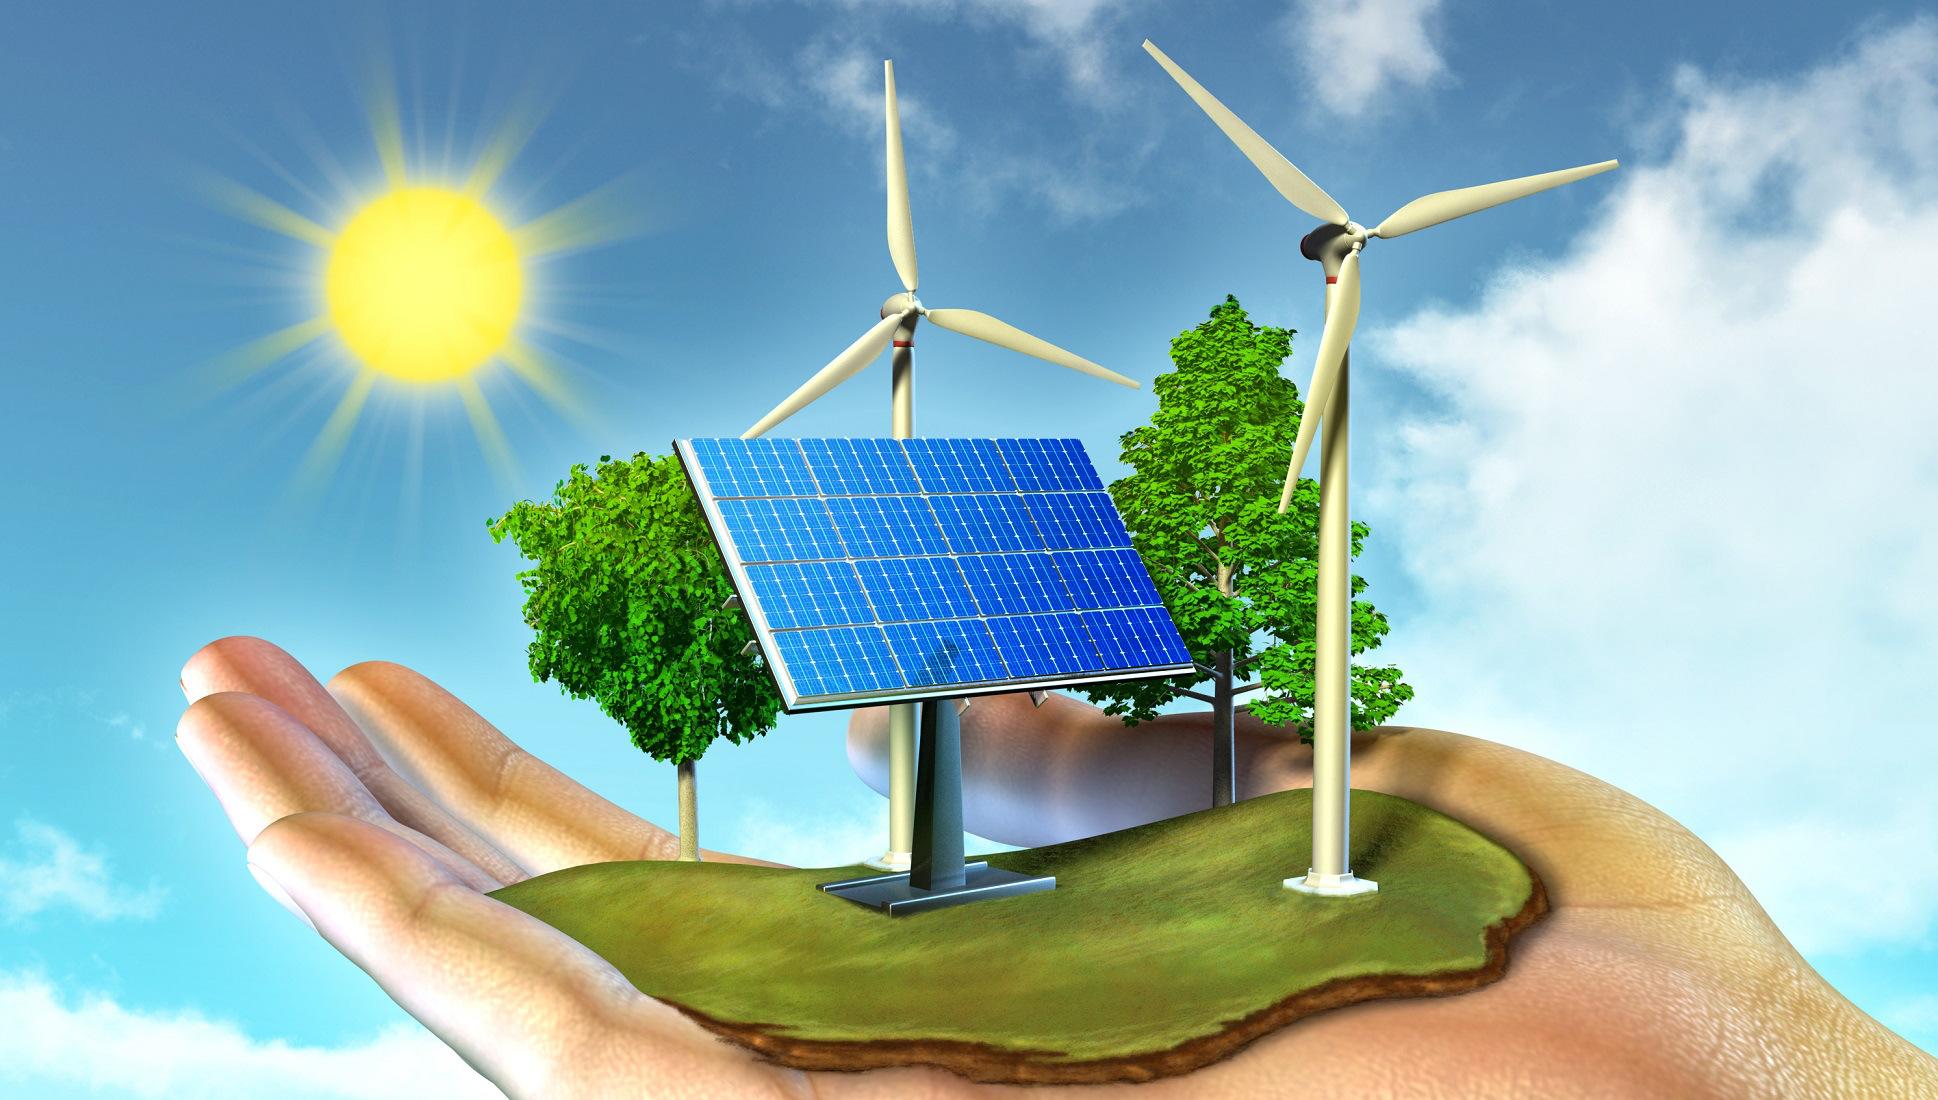 Energias renovables energias renovables en espa a - Fotos energias renovables ...